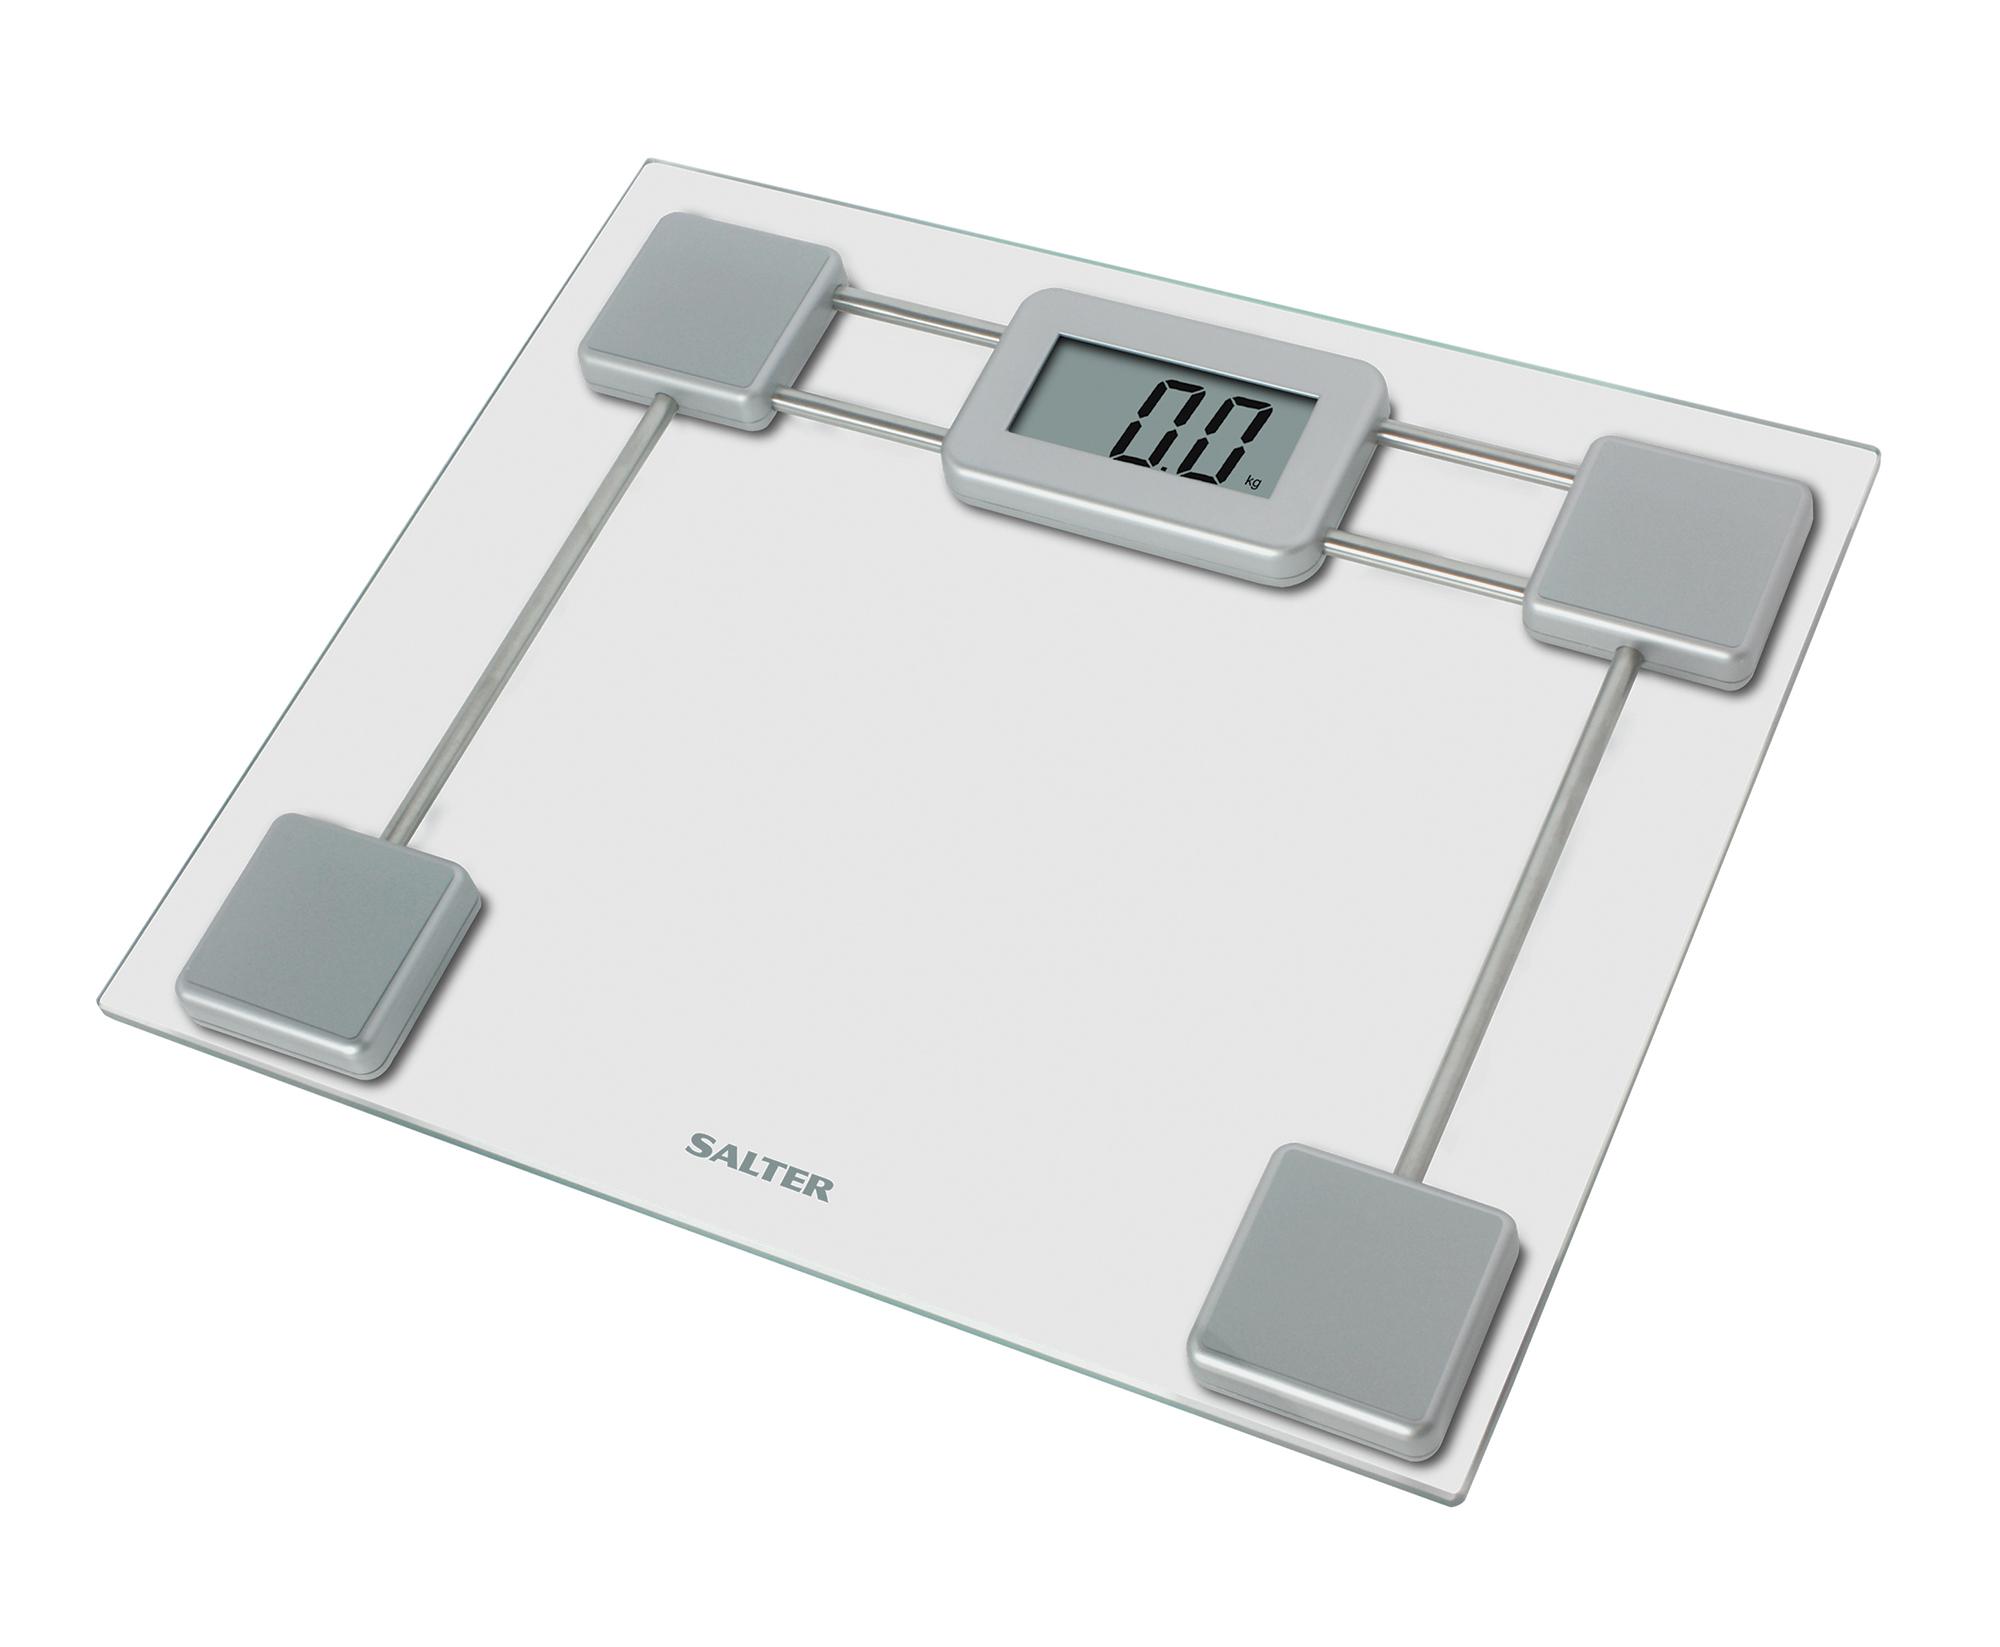 Salter Compact Platform Electronic Digital Bathroom Scale Glass 9081 SV3R